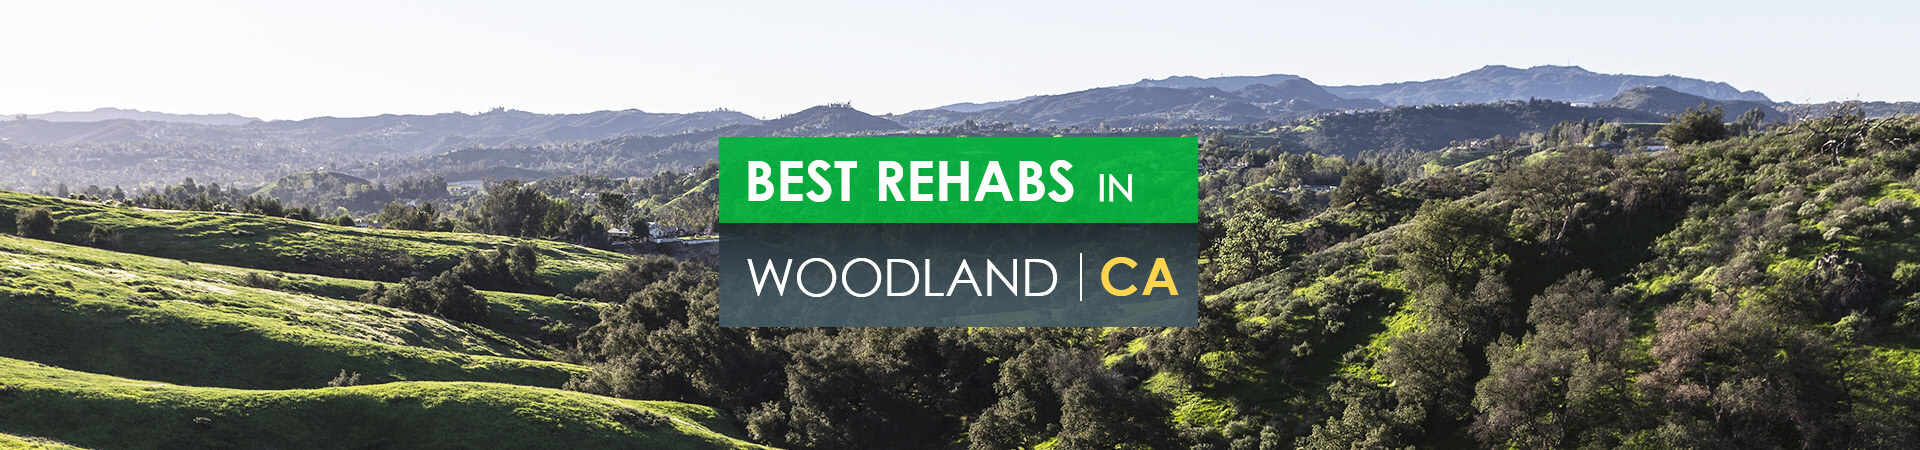 Best rehabs in Woodland, CA